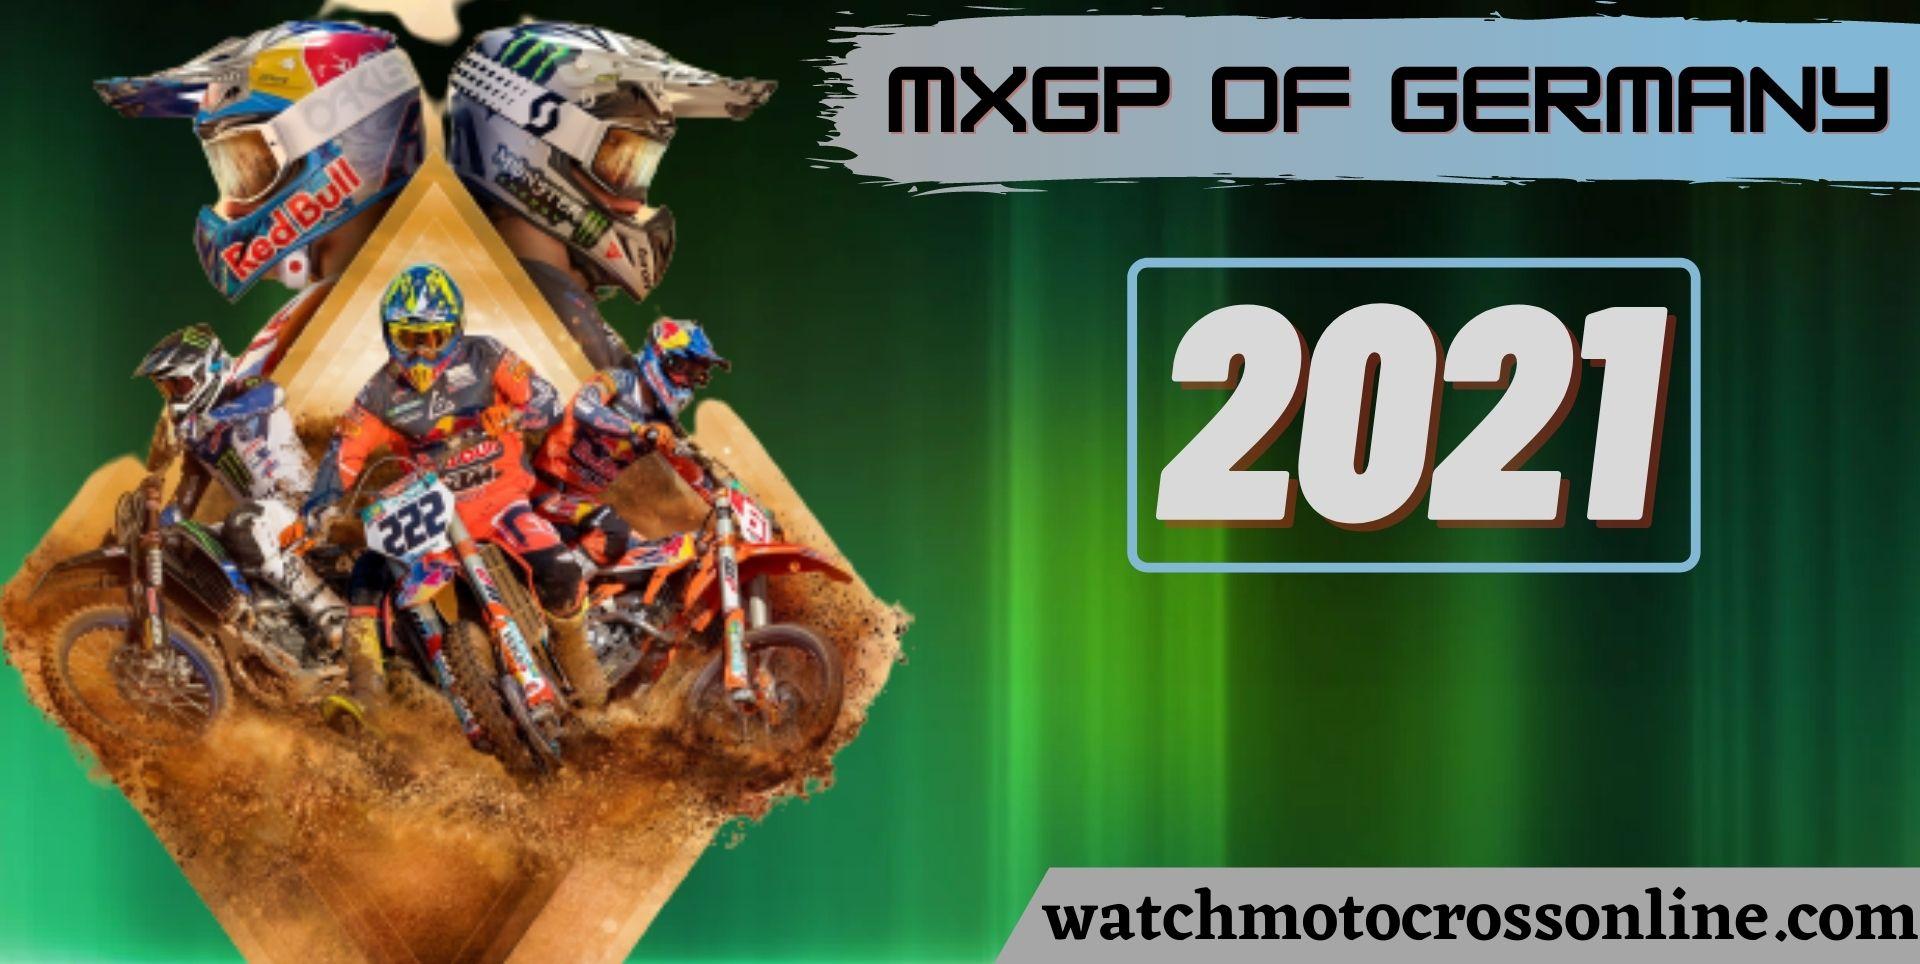 MXGP Of Germany Live Stream 2021